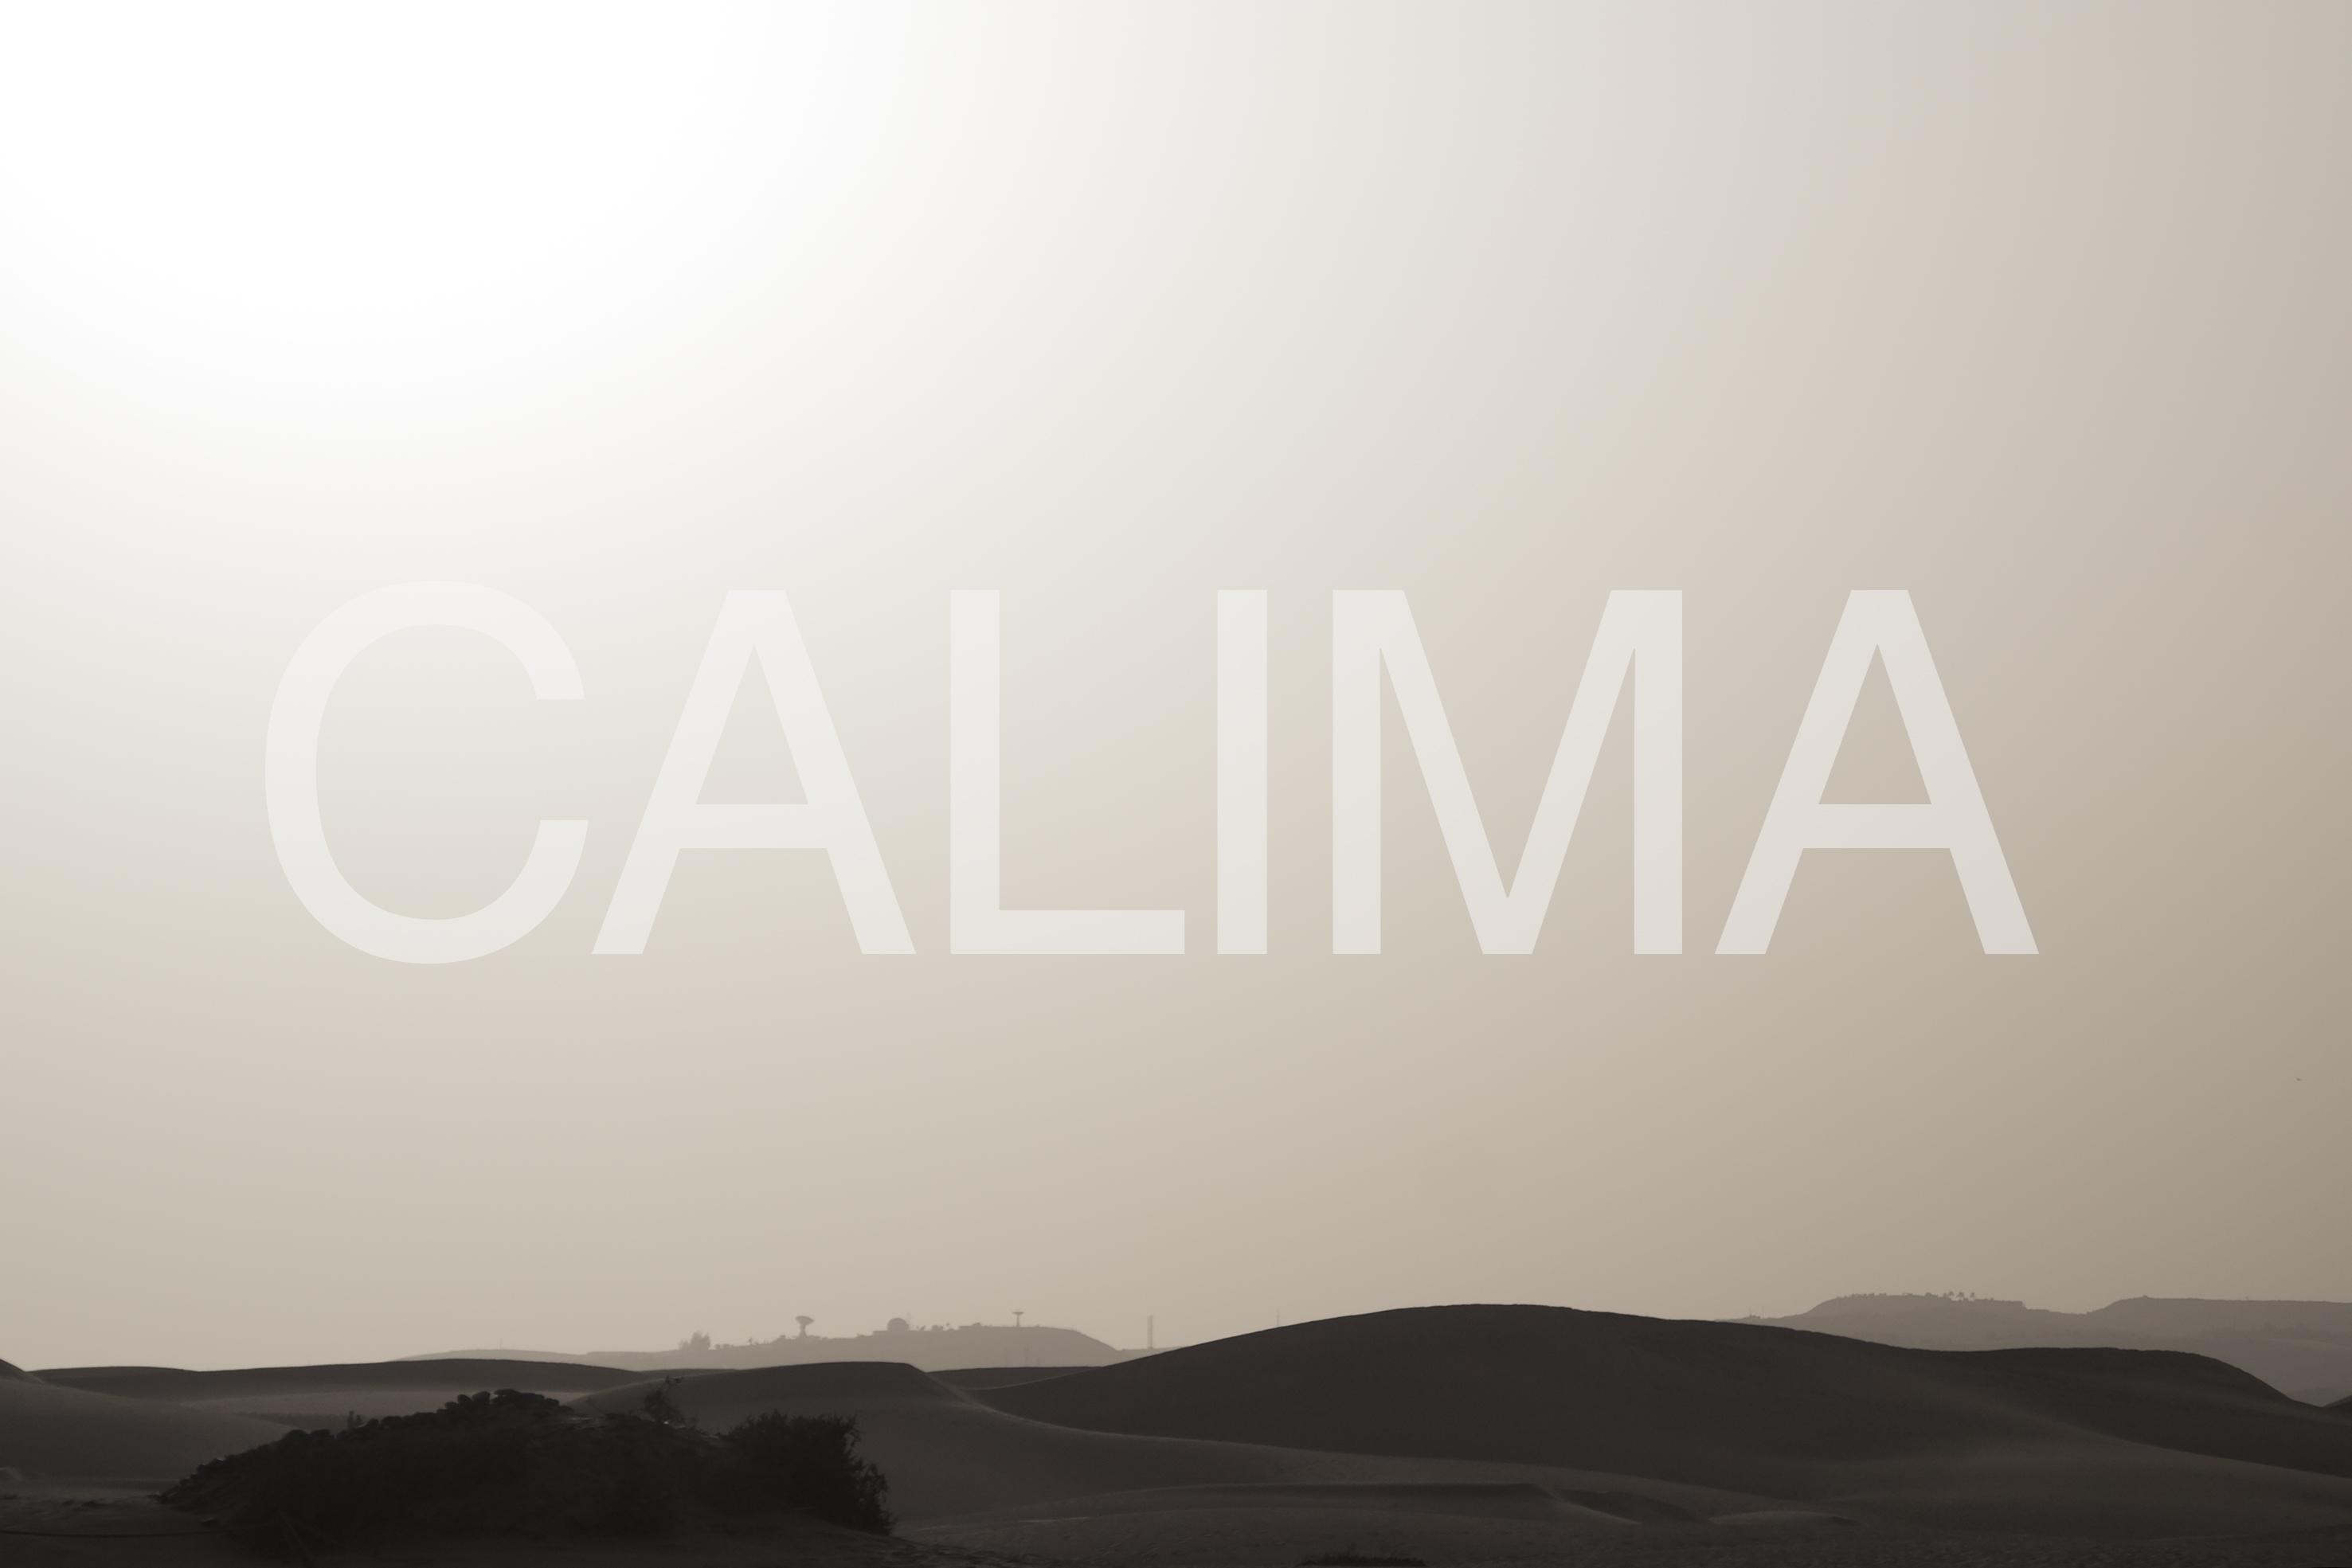 David Guillén - Photo Graphic Design